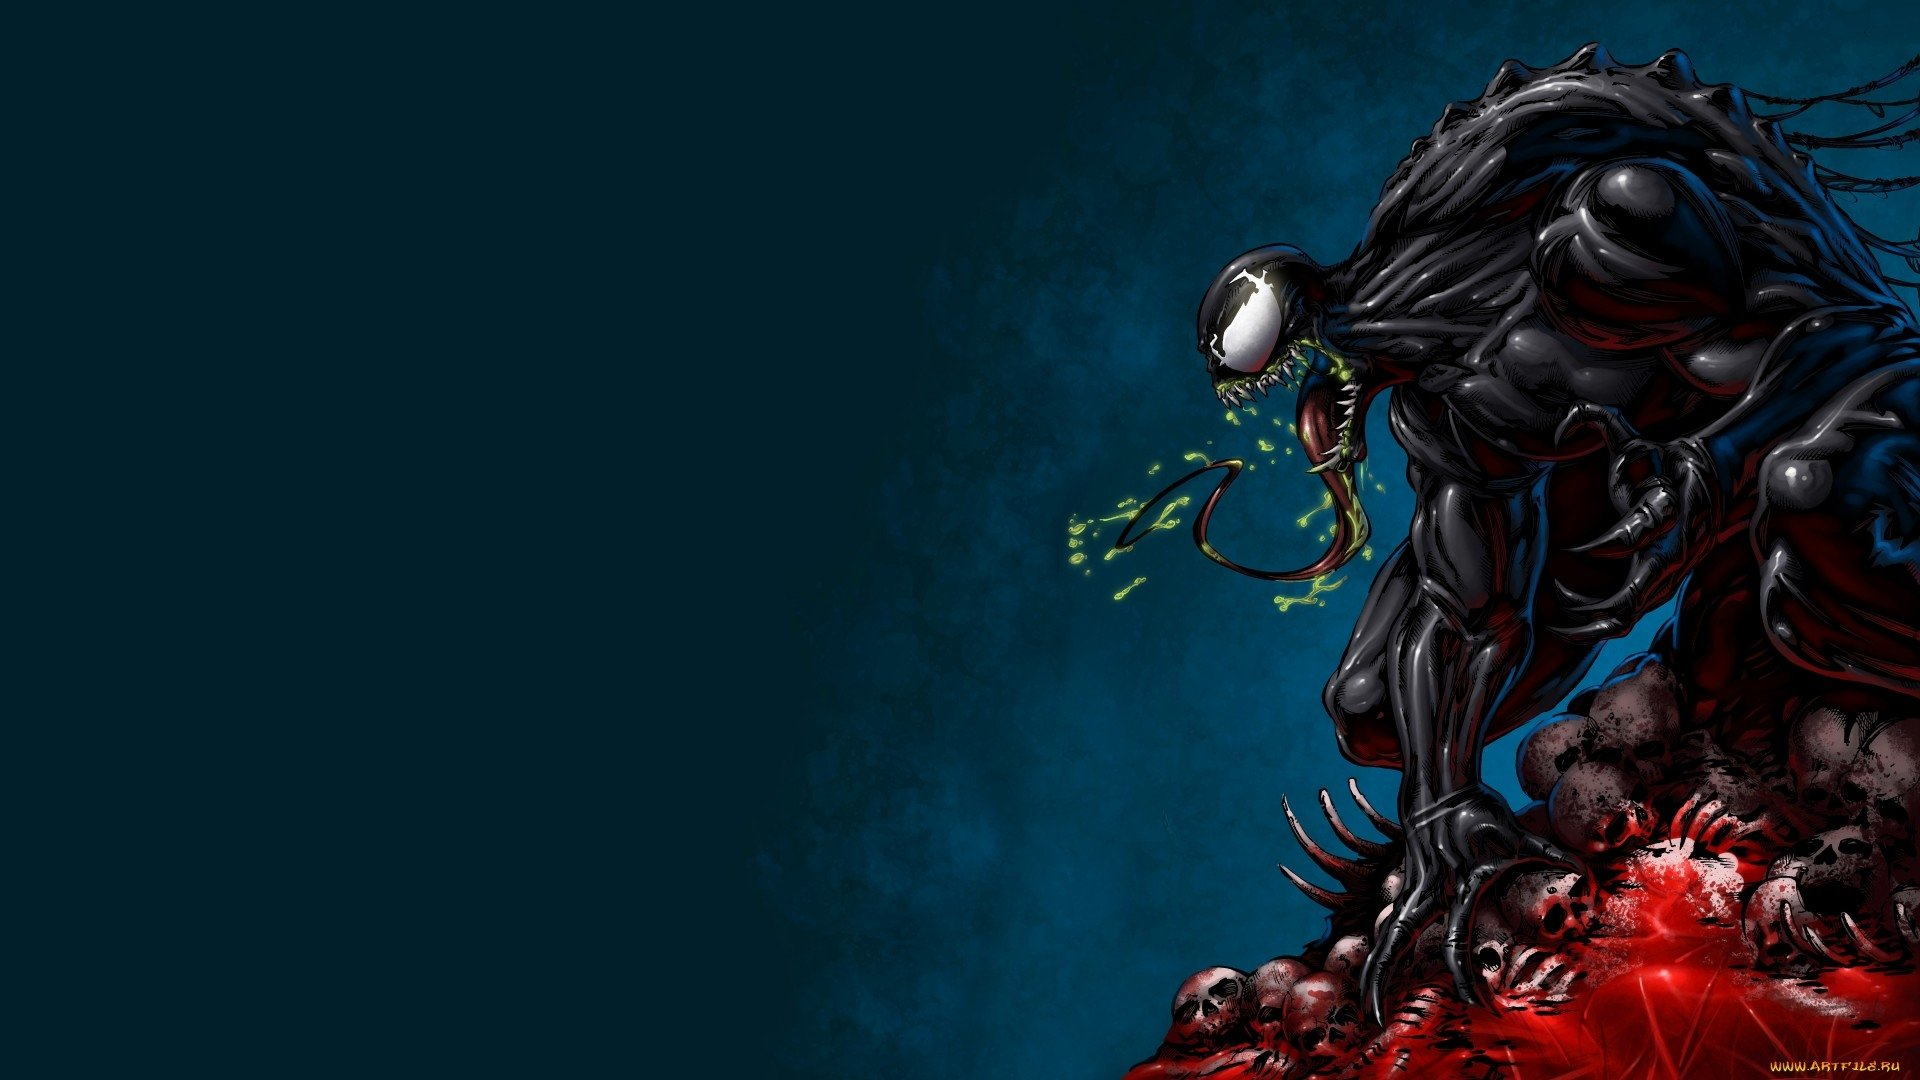 venom wallpaper hd 1920x1080 - photo #19